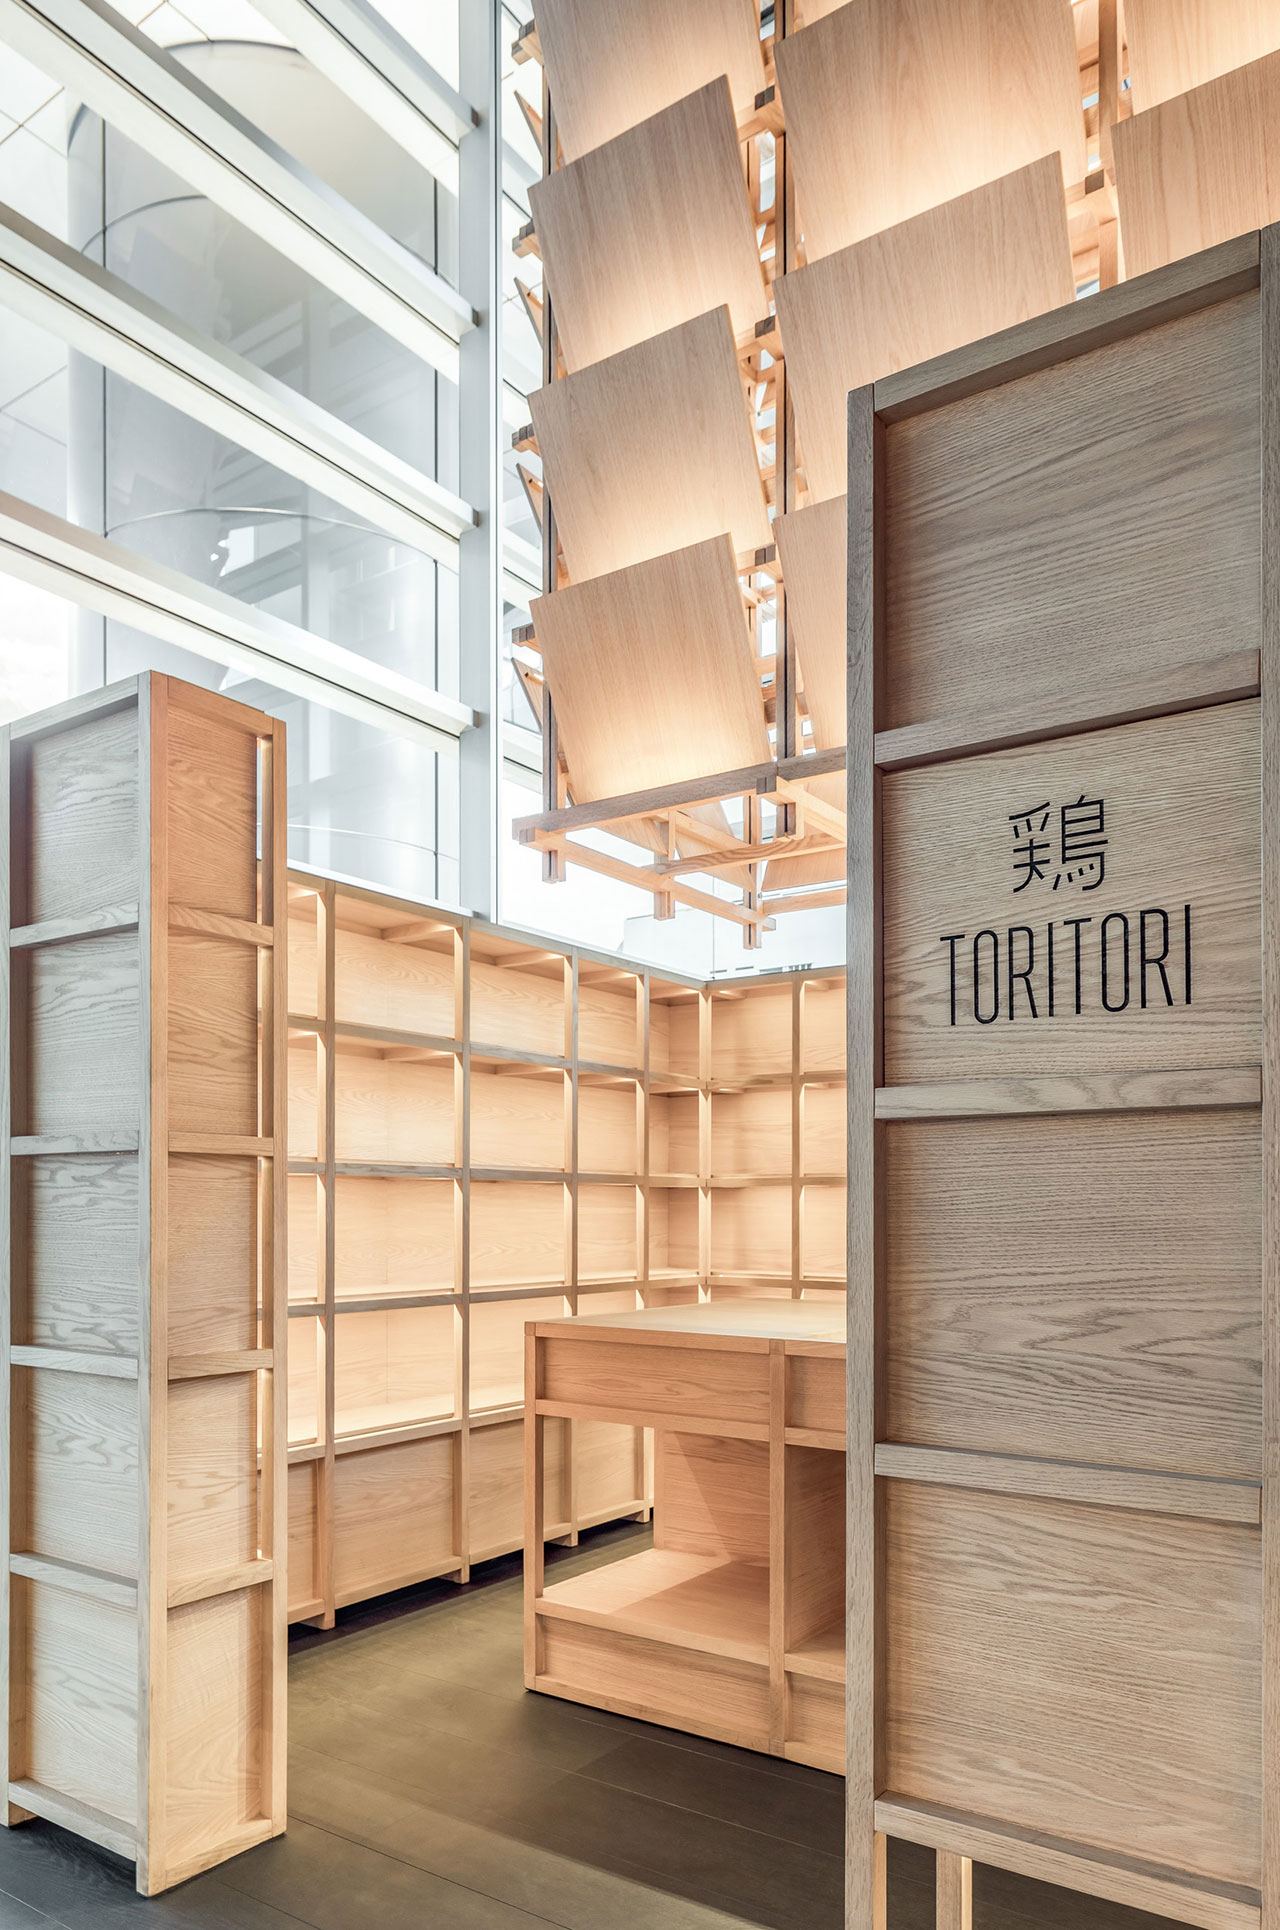 Tori Tori Santa Fe byEsrawe Studio. Photo by Cesar Bejar.